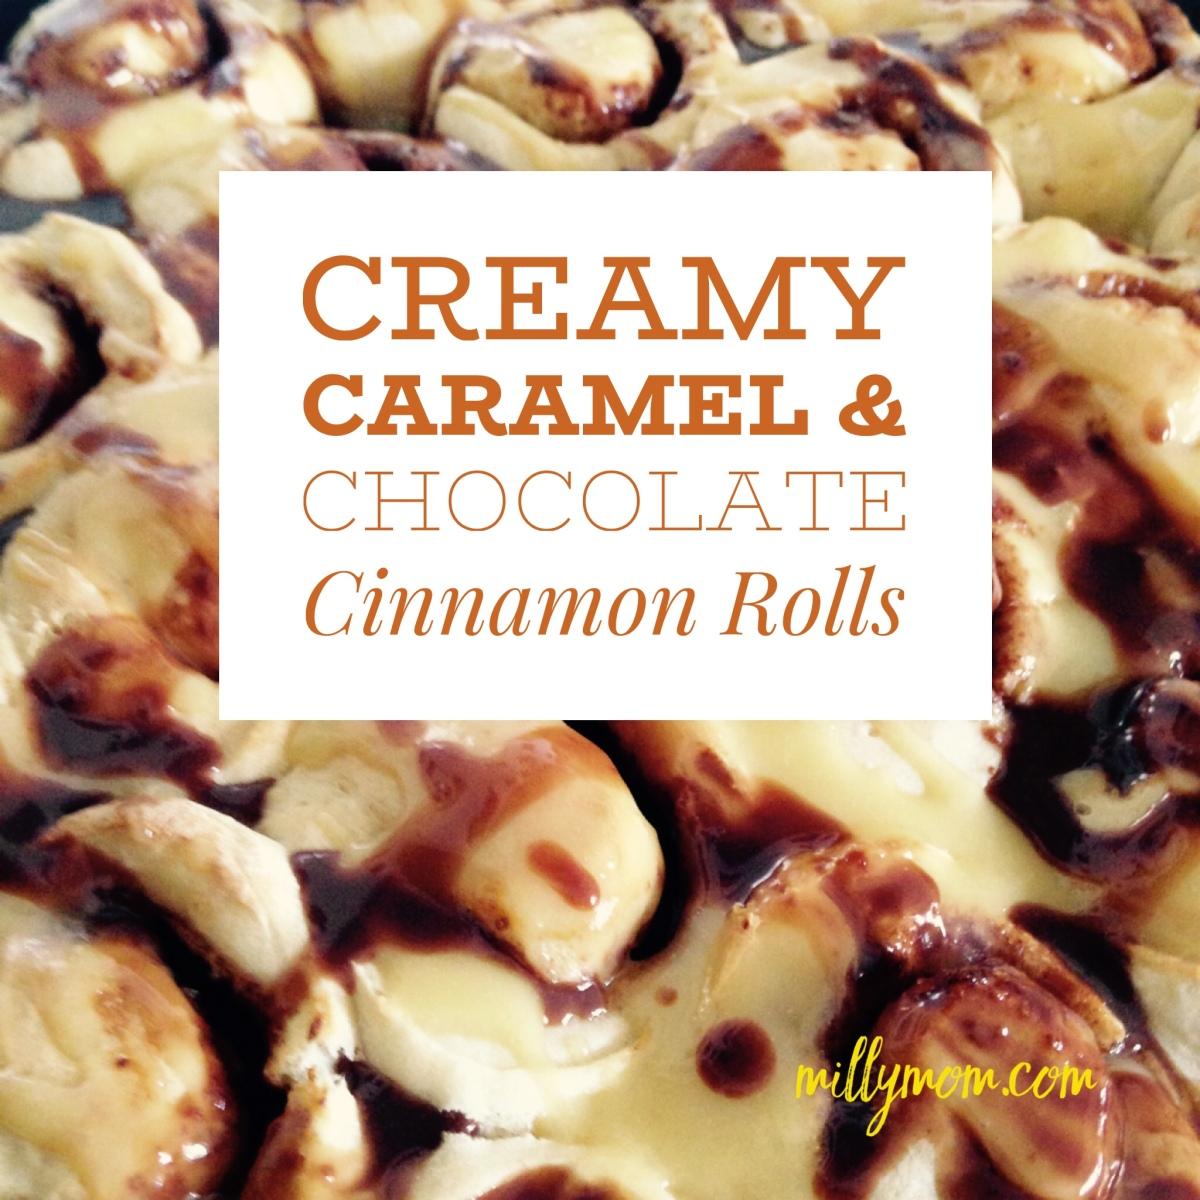 Creamy Caramel & Chocolate Cinnamon Rolls